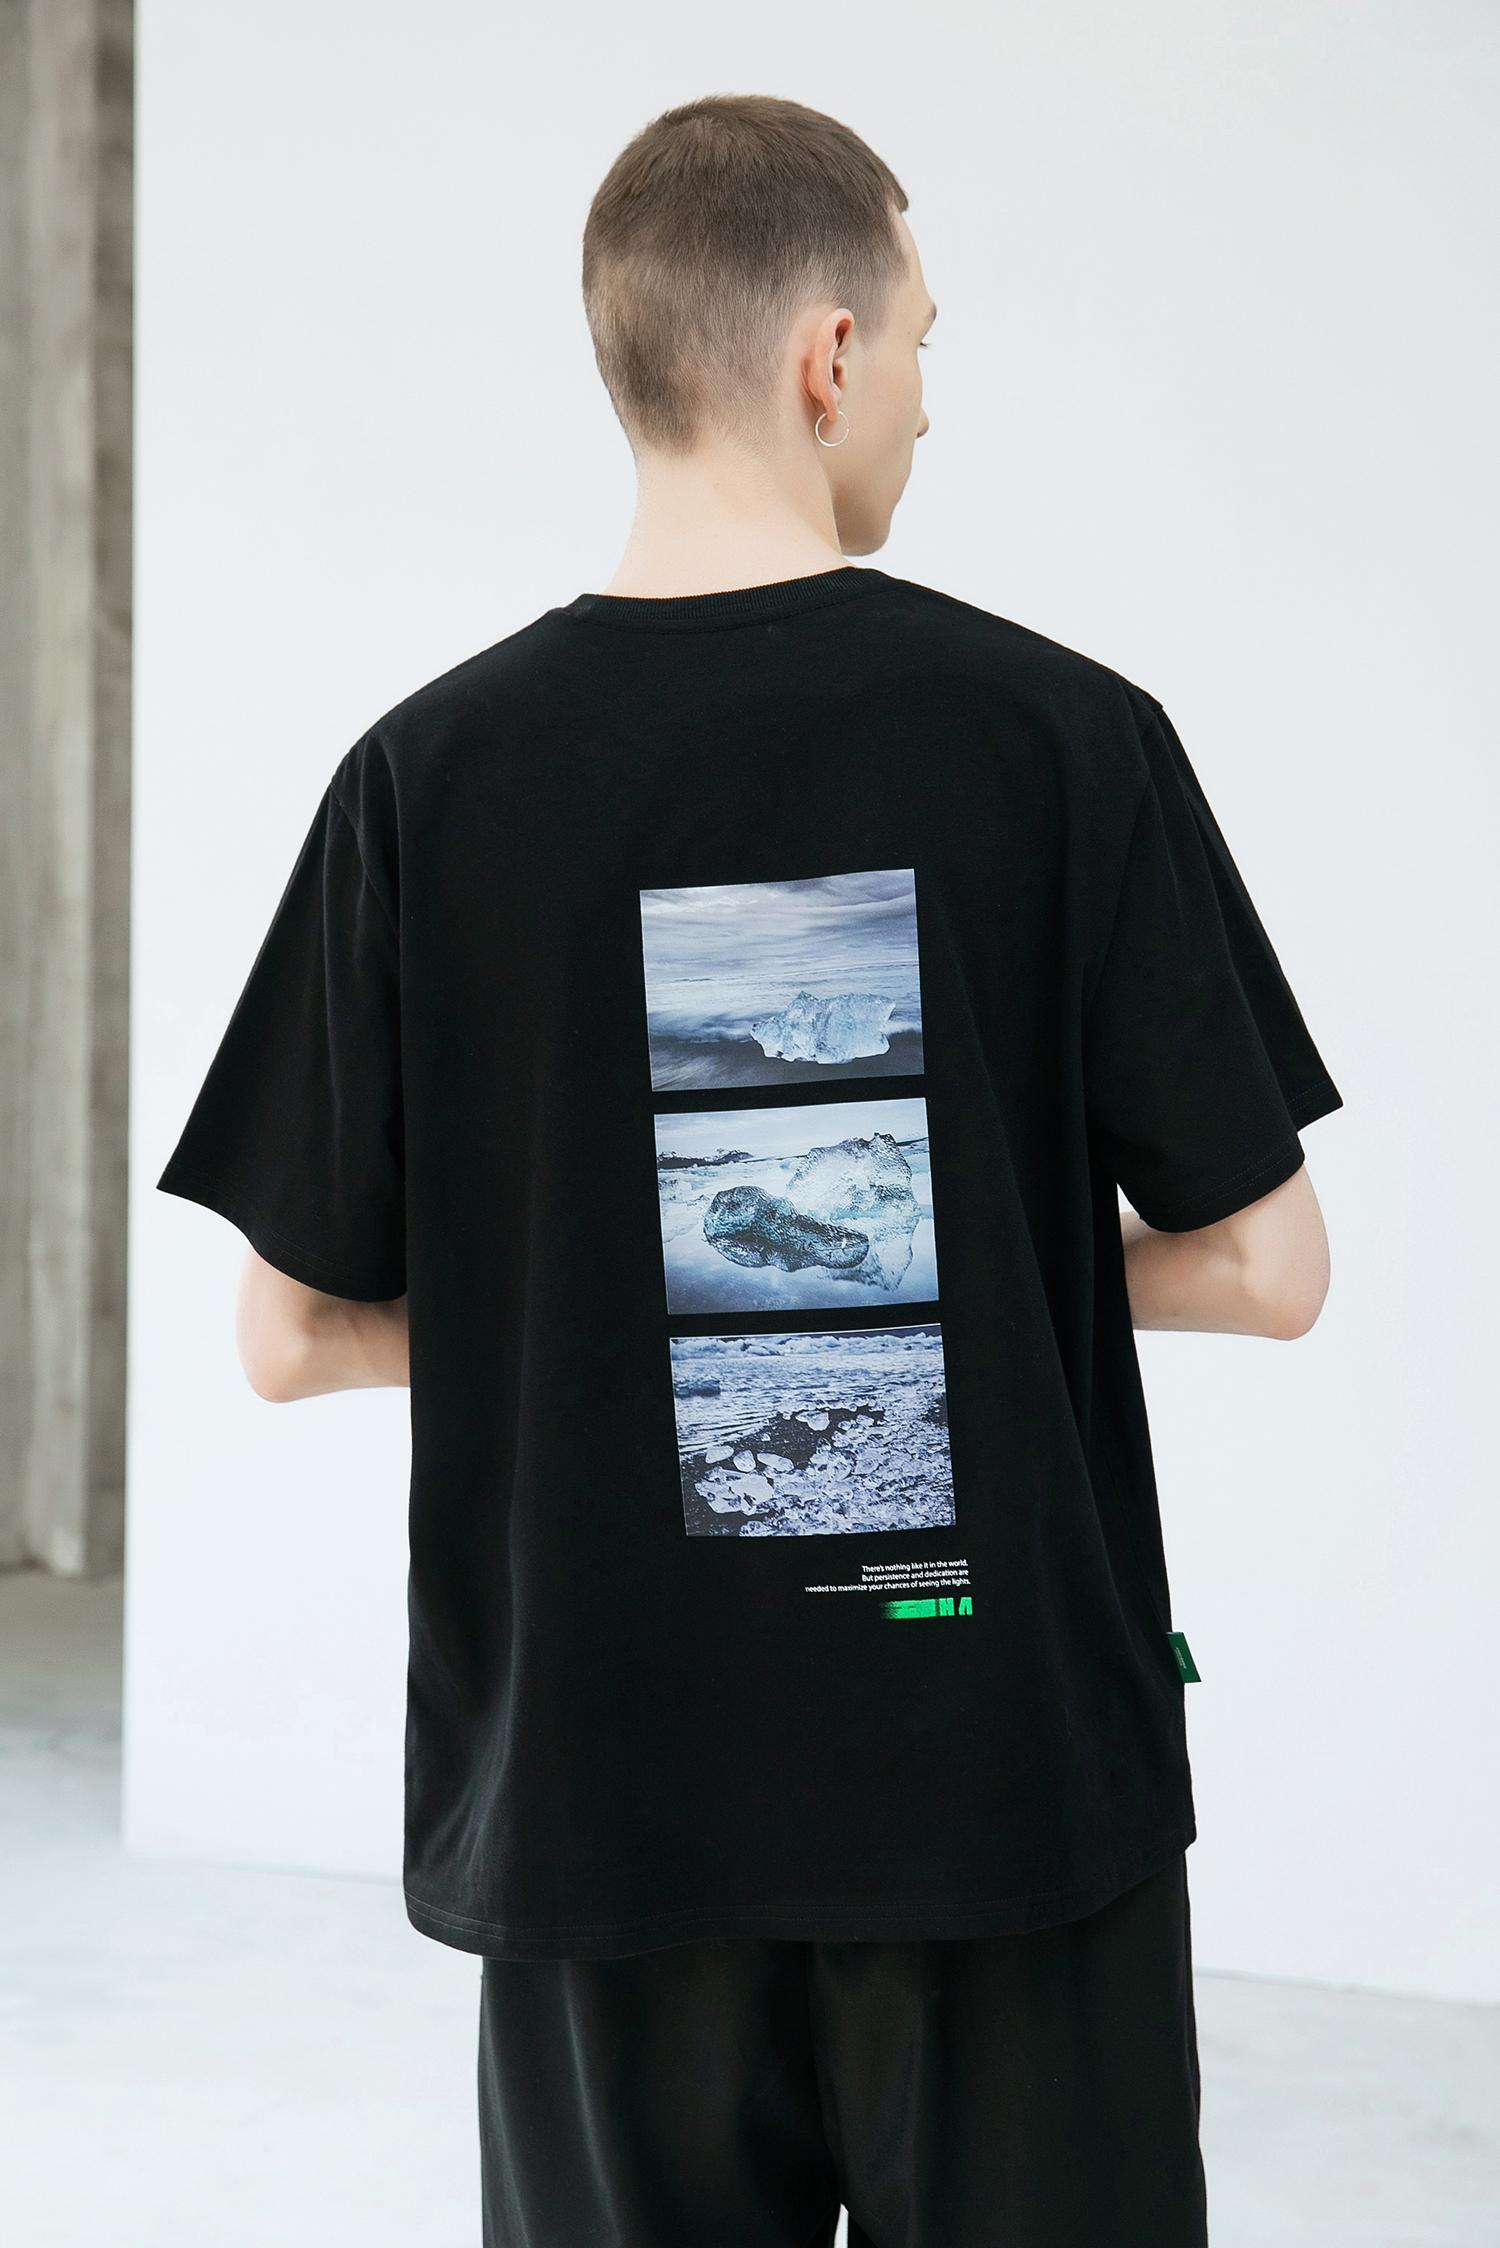 GRINCH1928「GAHA」冰岛英文印花纯棉短袖T恤男夏季打底衫半袖TEE(「GAHA」冰岛英文印花纯棉短袖T恤)